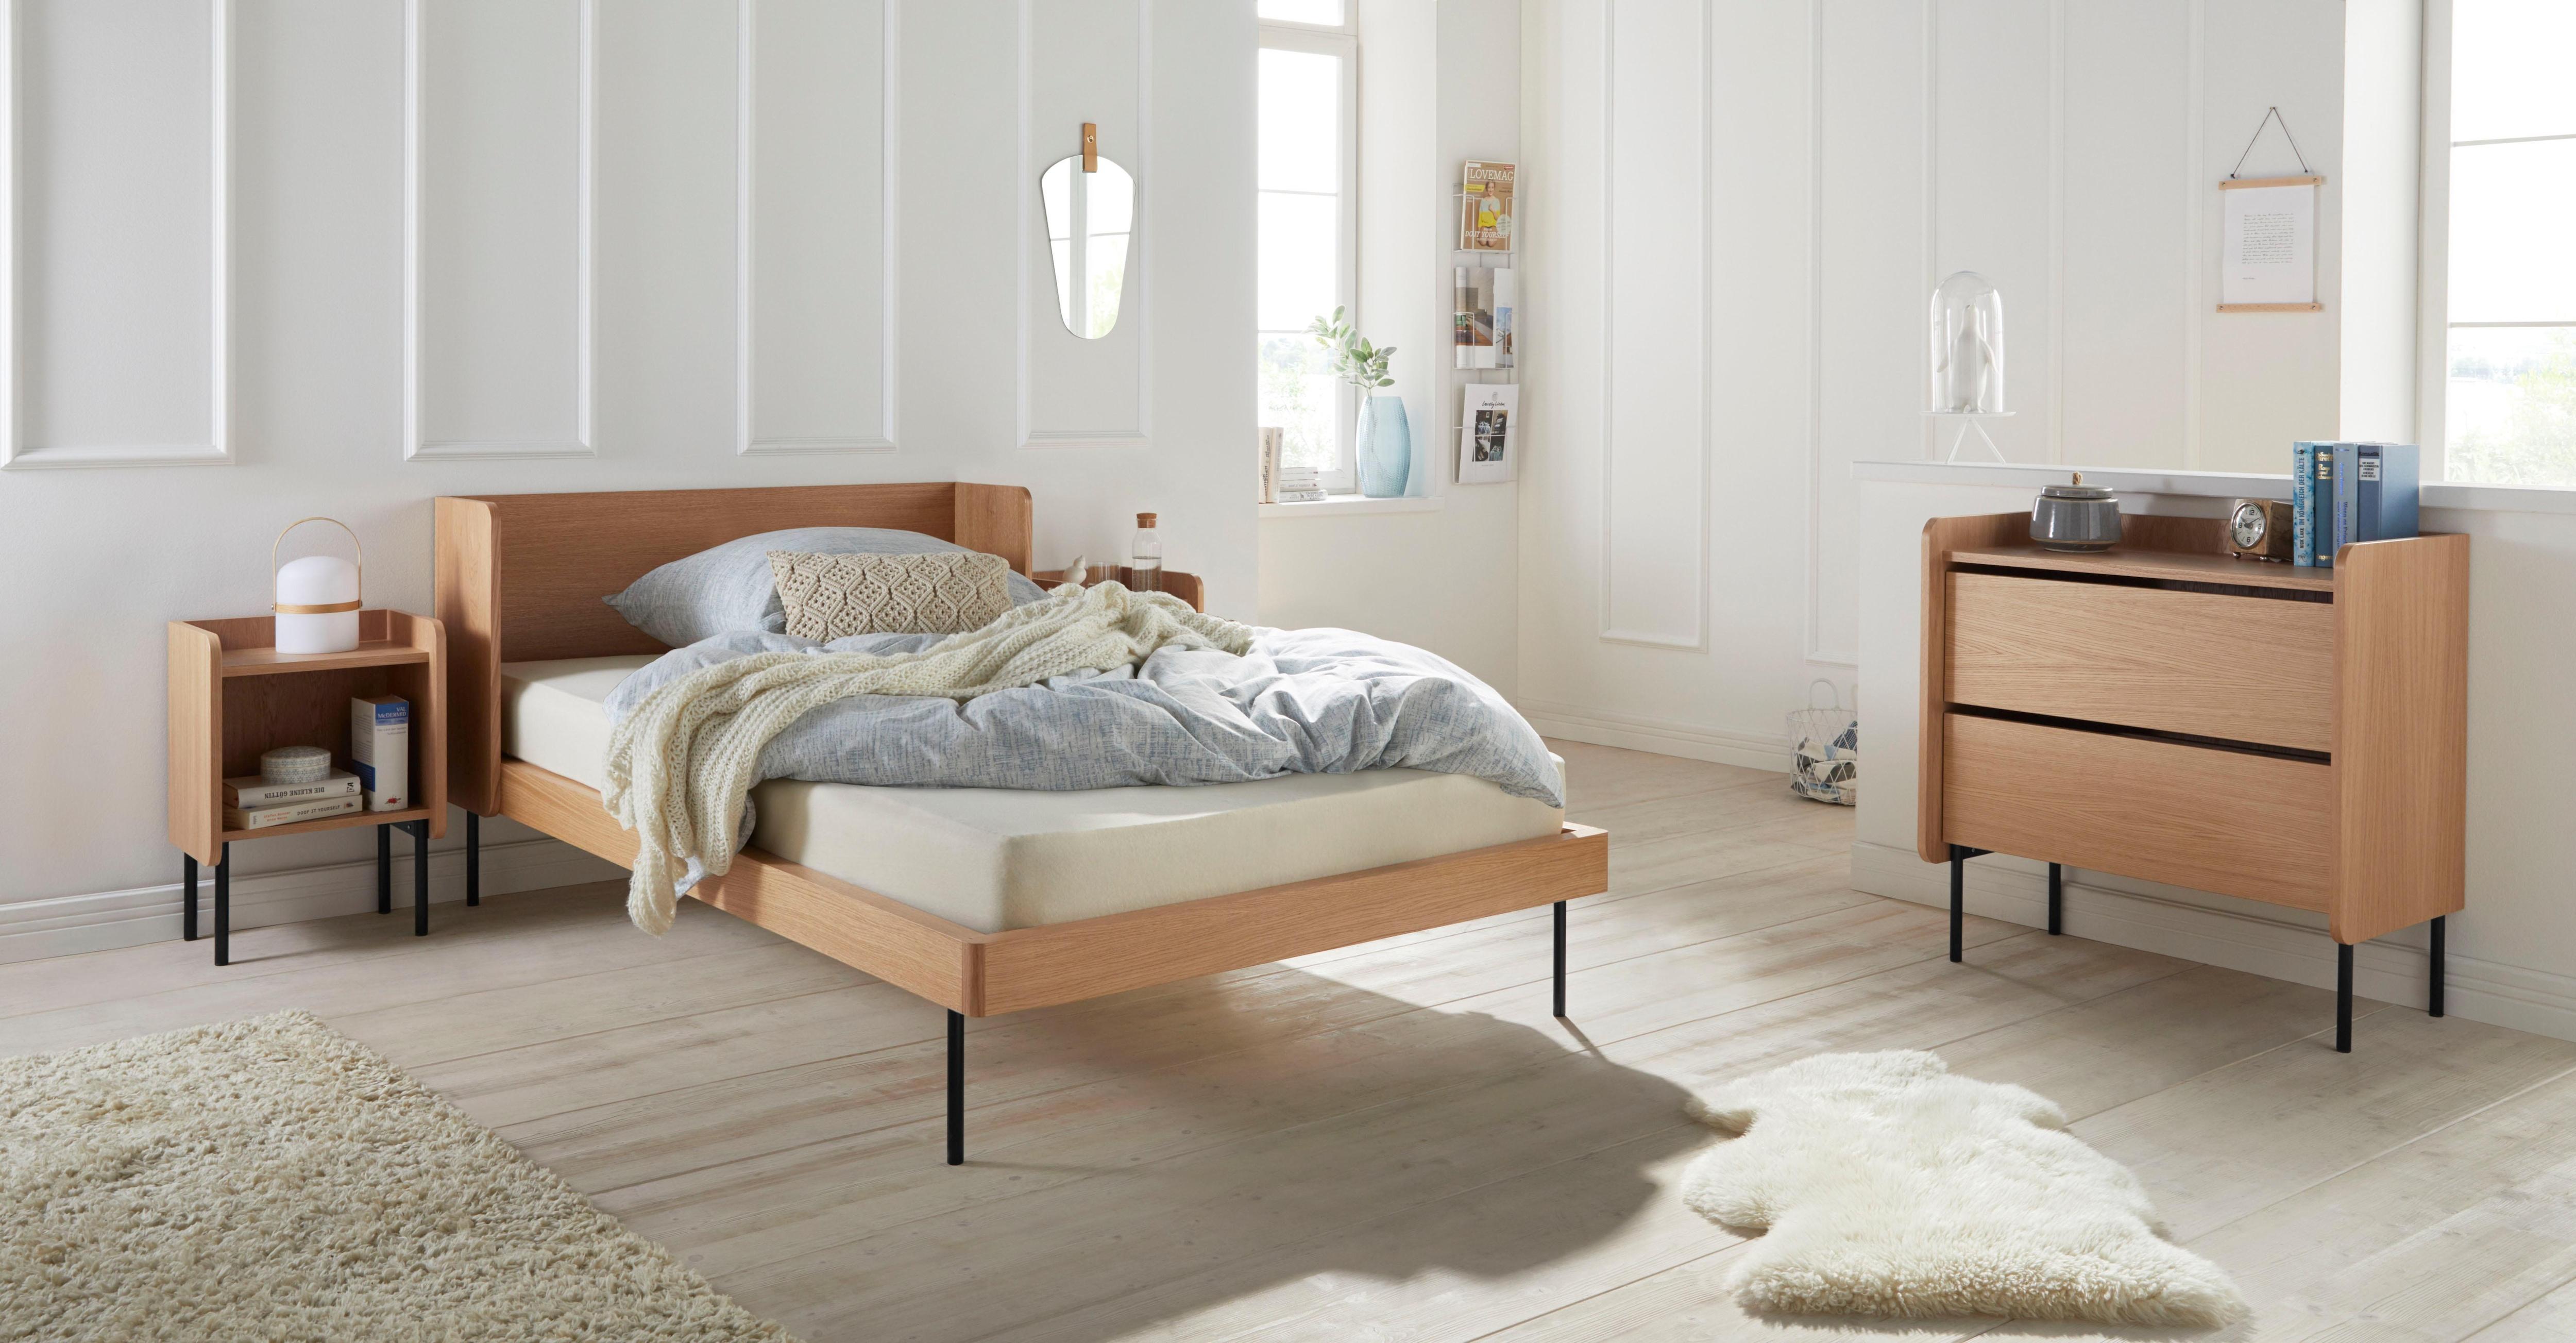 andas Bett Wrap, im skandinavischen Stil beige Doppelbetten Betten